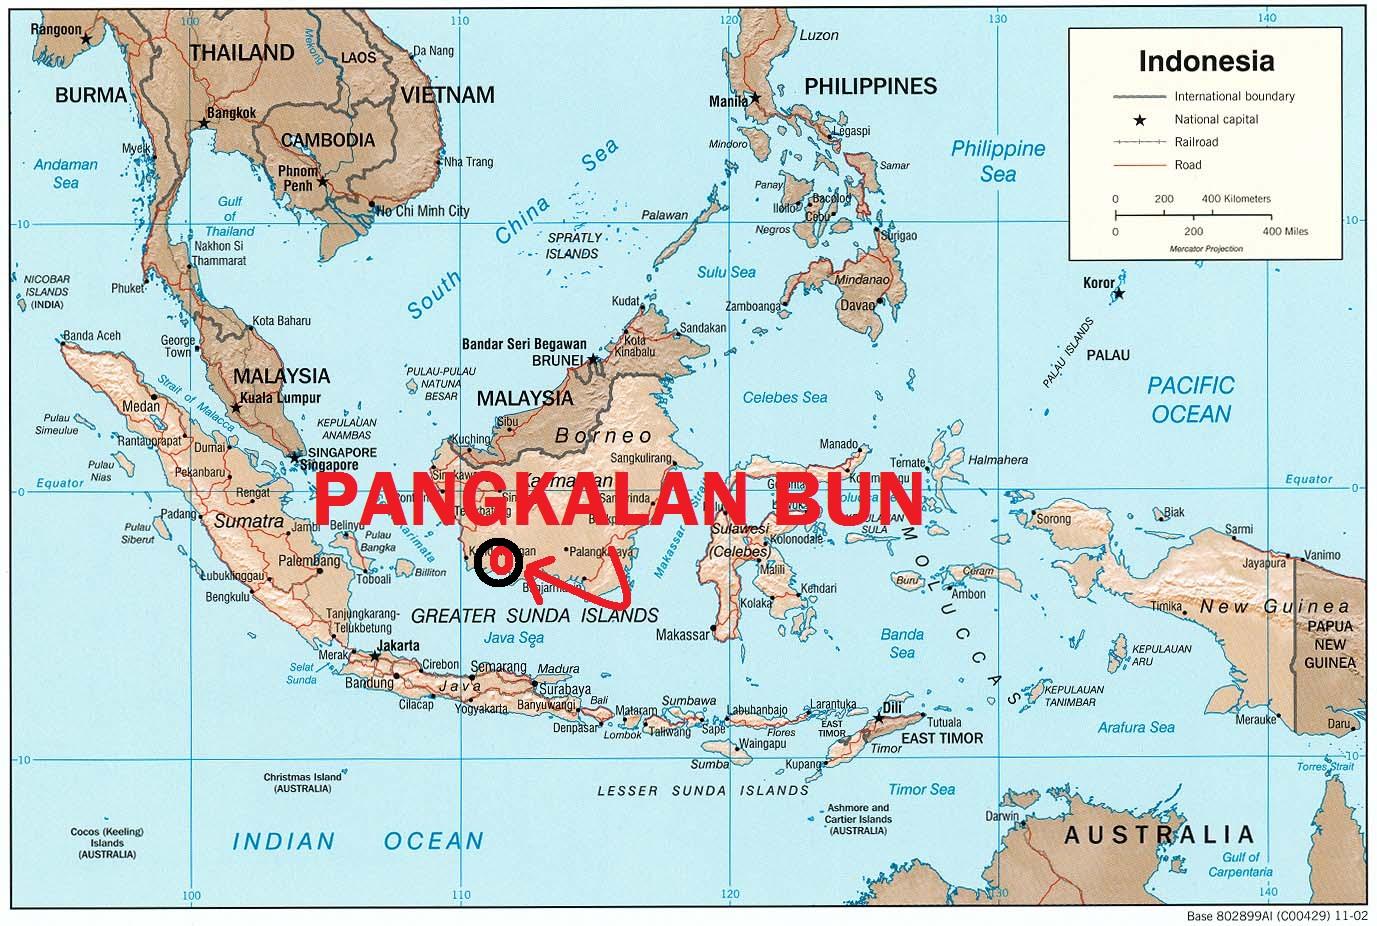 Arsyil_keren`s Blog: Kelebihan PANGKALAN BUN, Kota Cocok Menjadi.